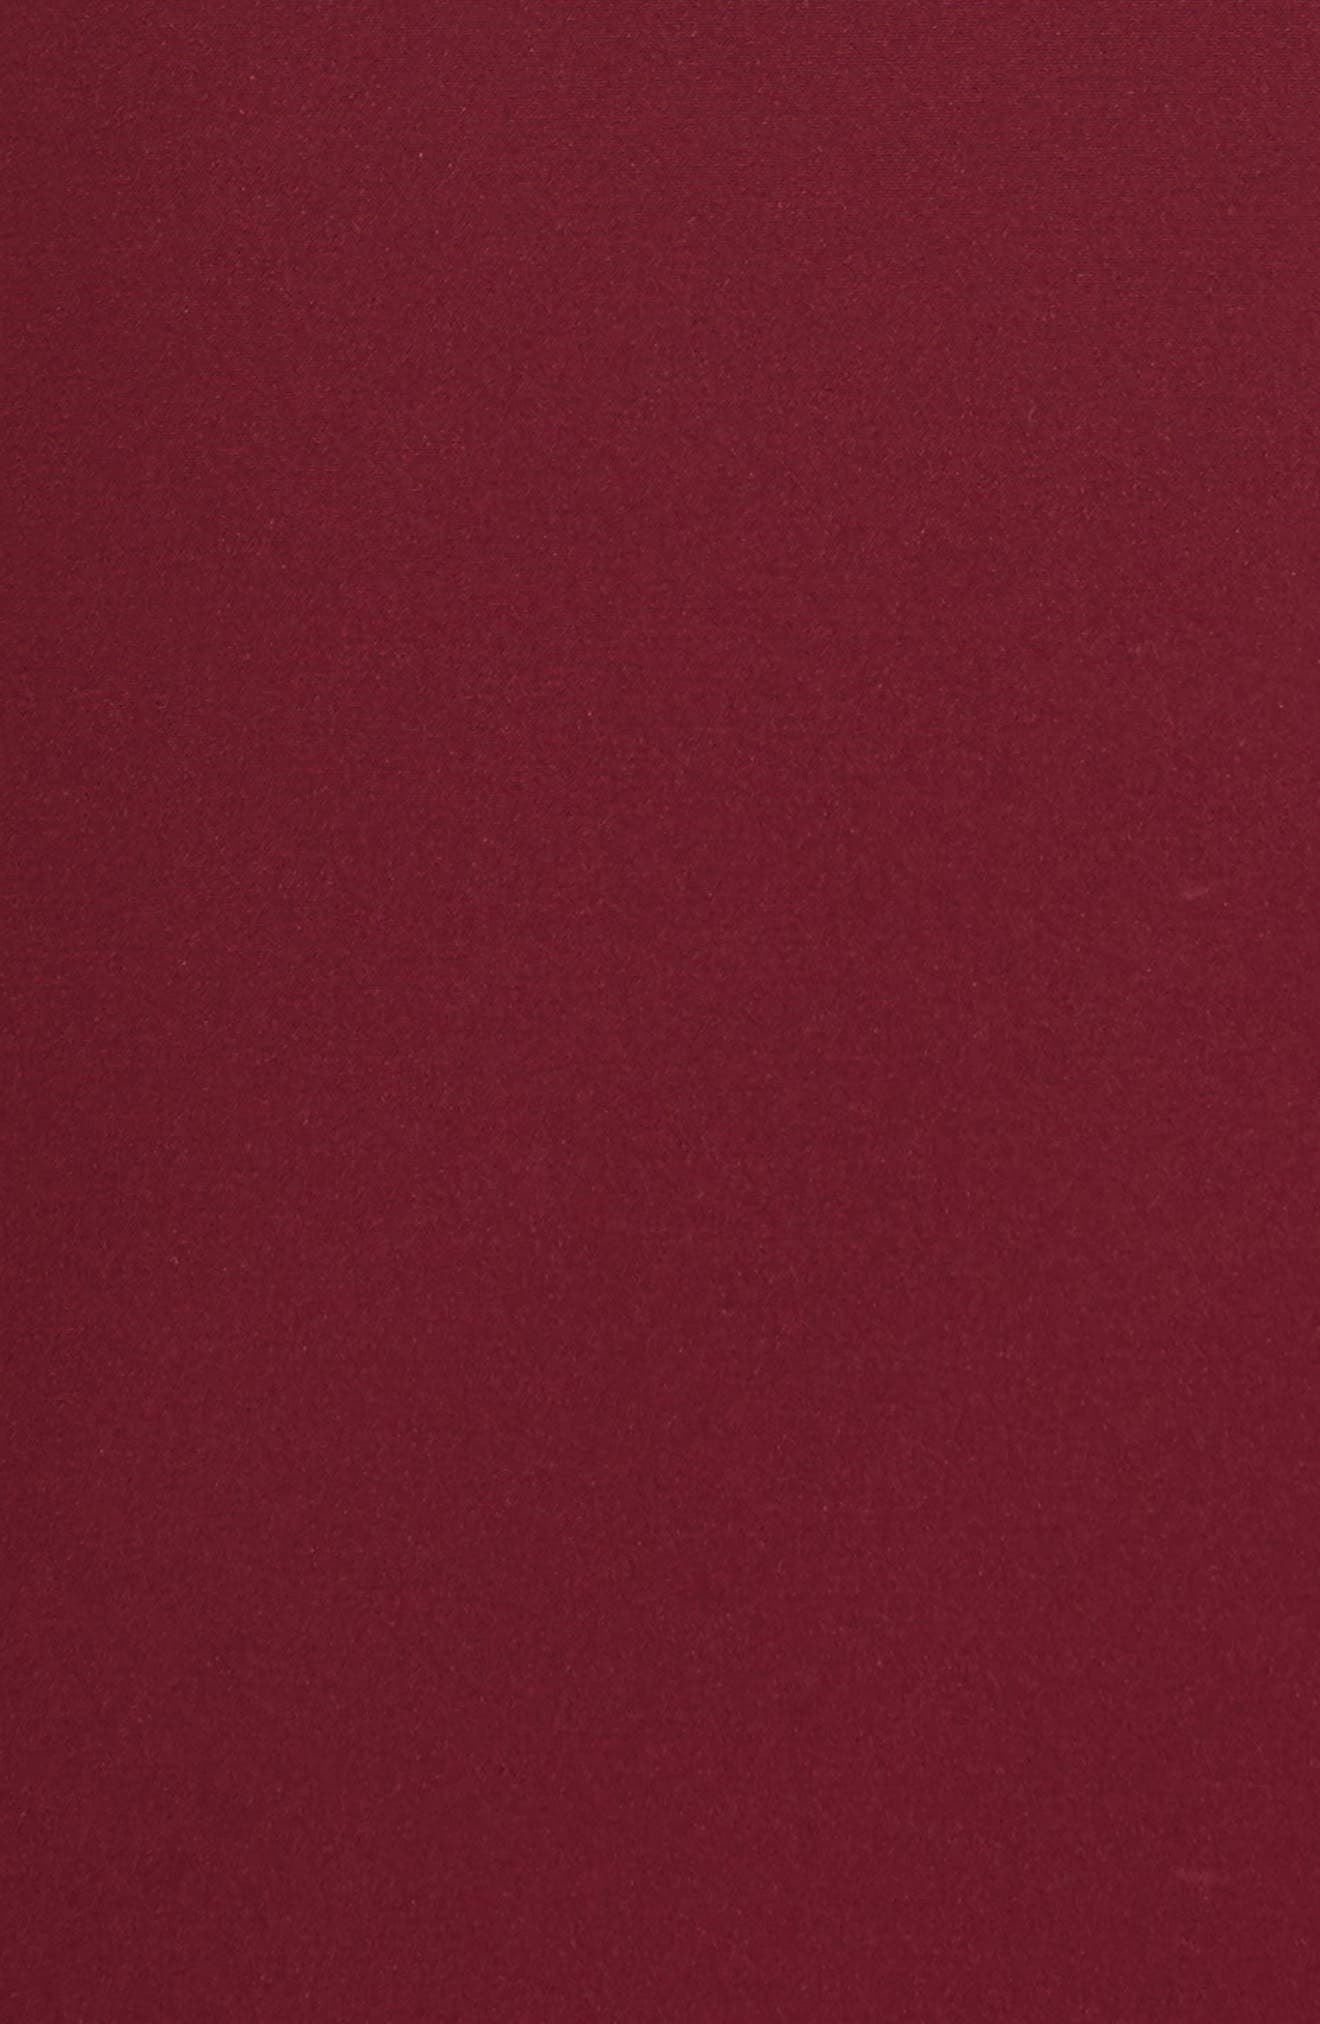 Sidra Emory Cloth Dress,                             Alternate thumbnail 5, color,                             930